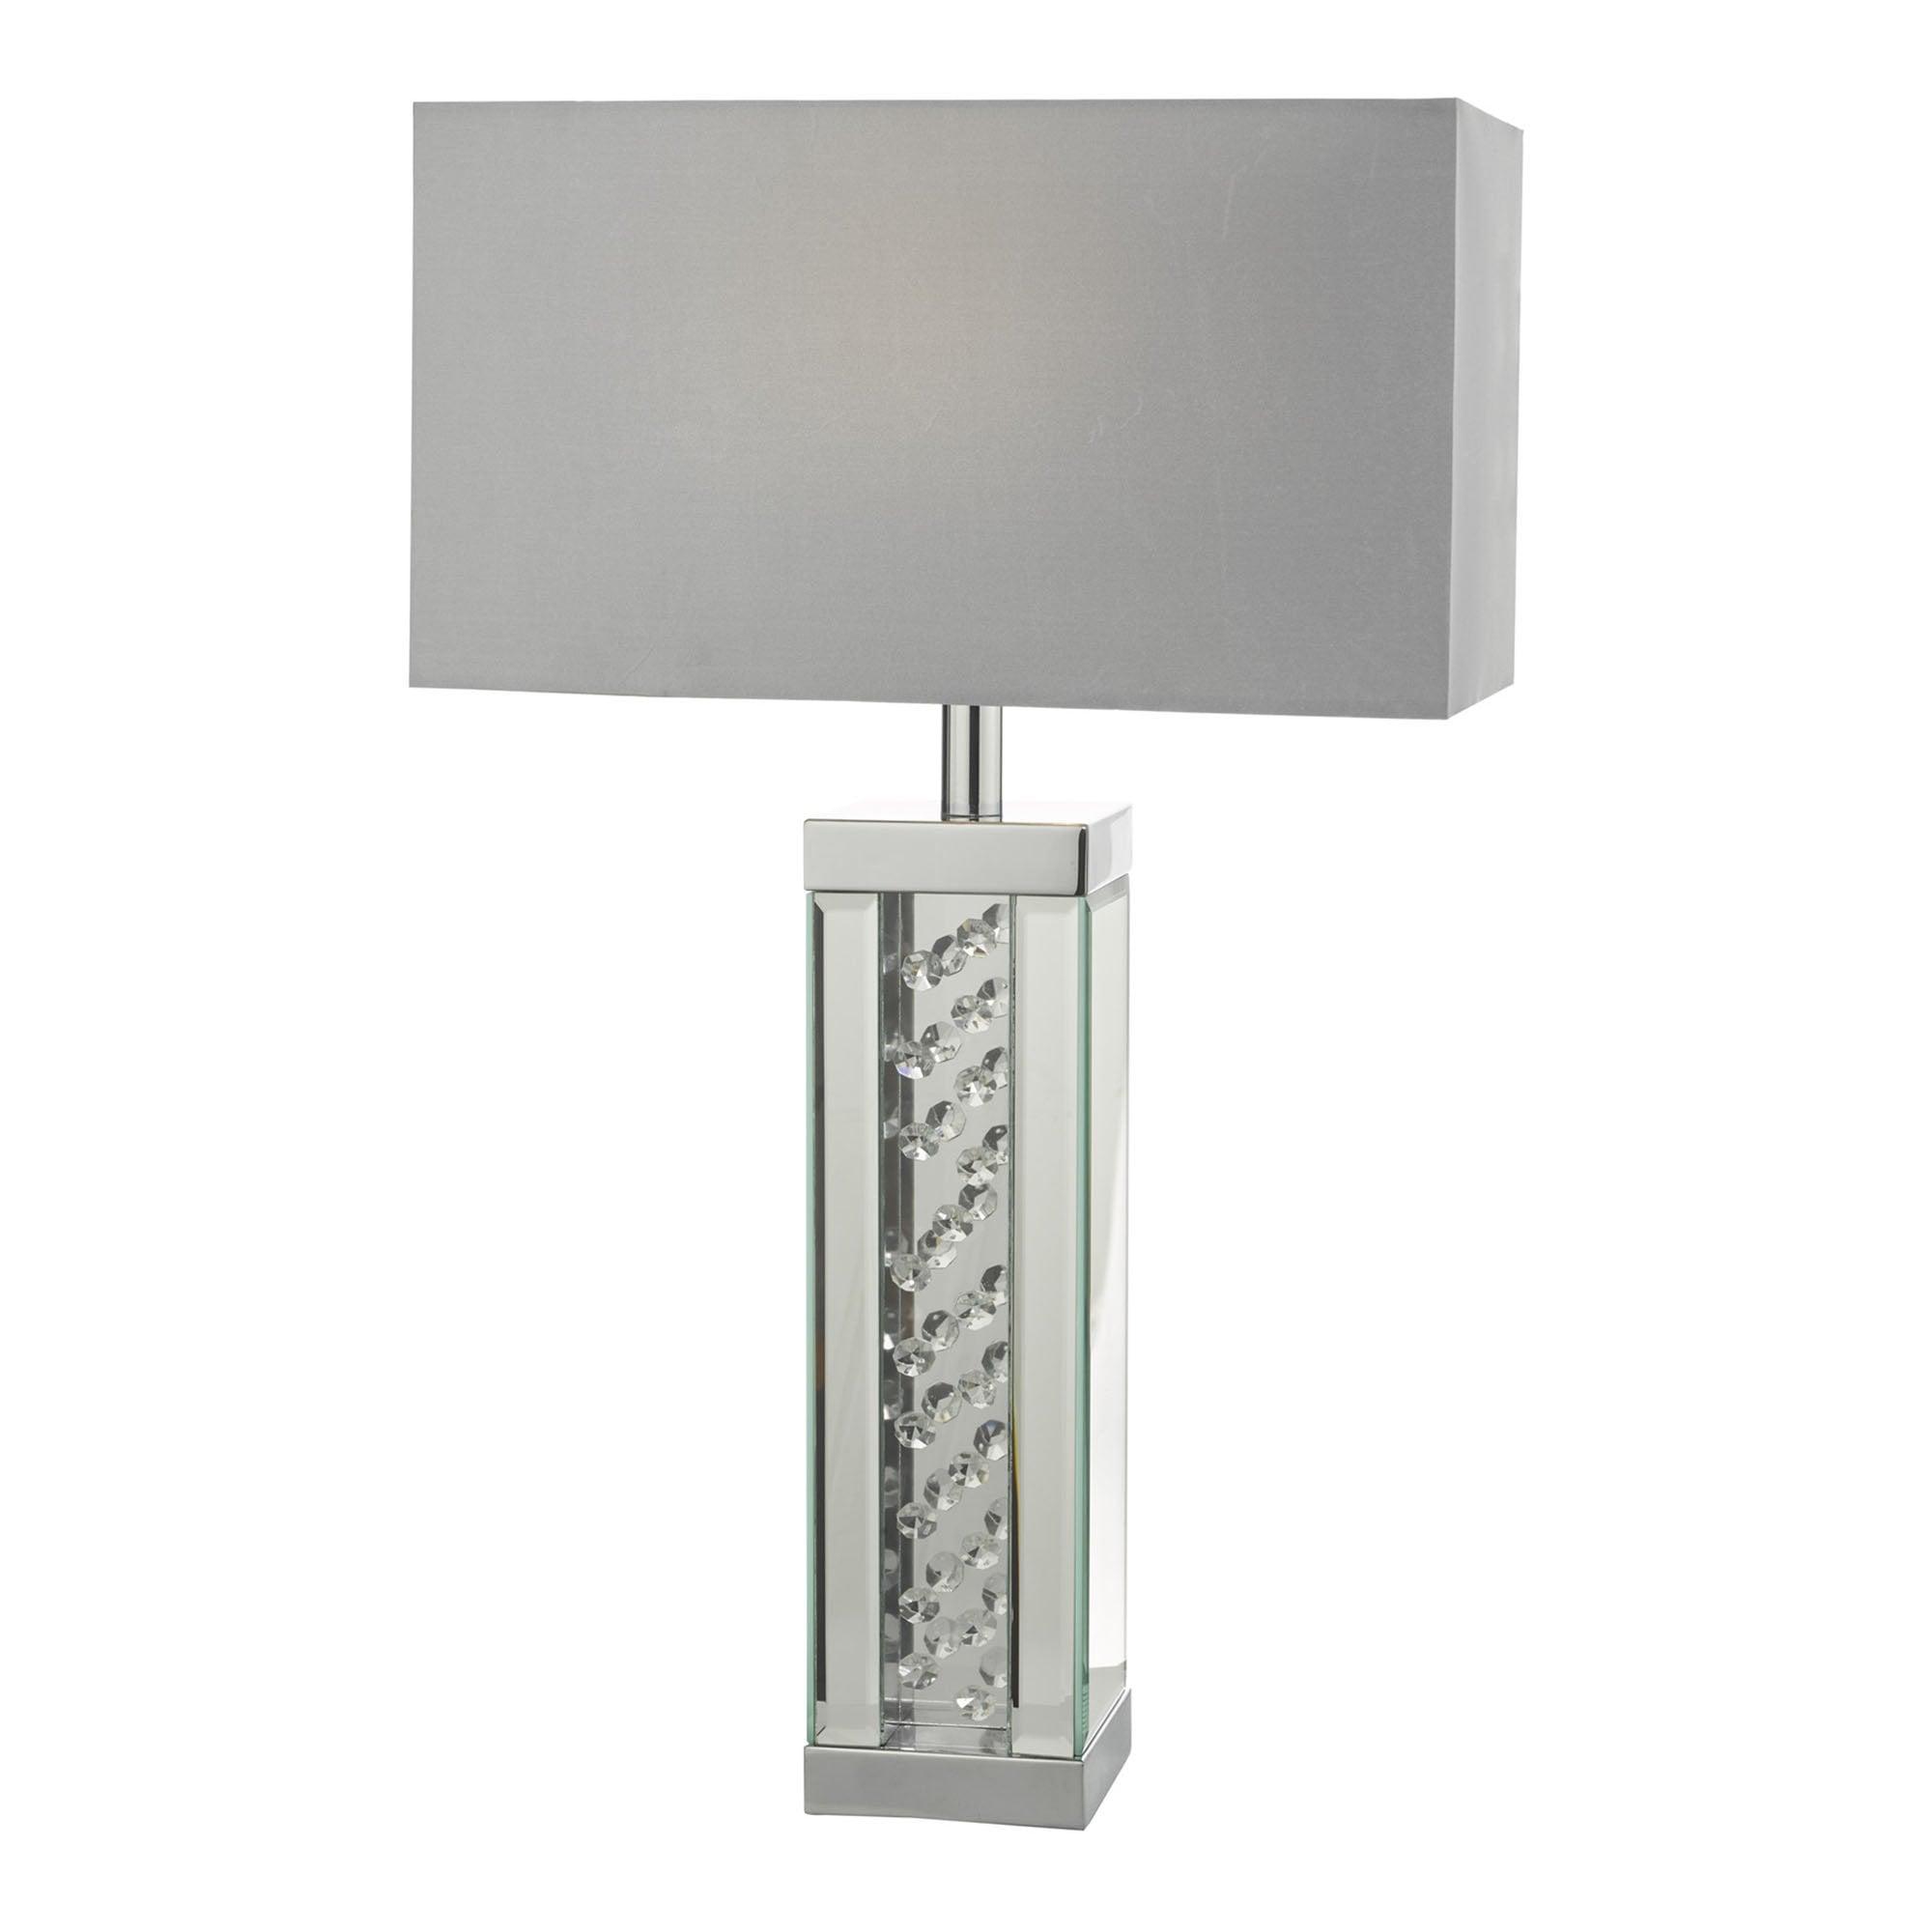 IRALIA Rectangular Table Lamp Crystal & Polished Chrome With Grey Shade